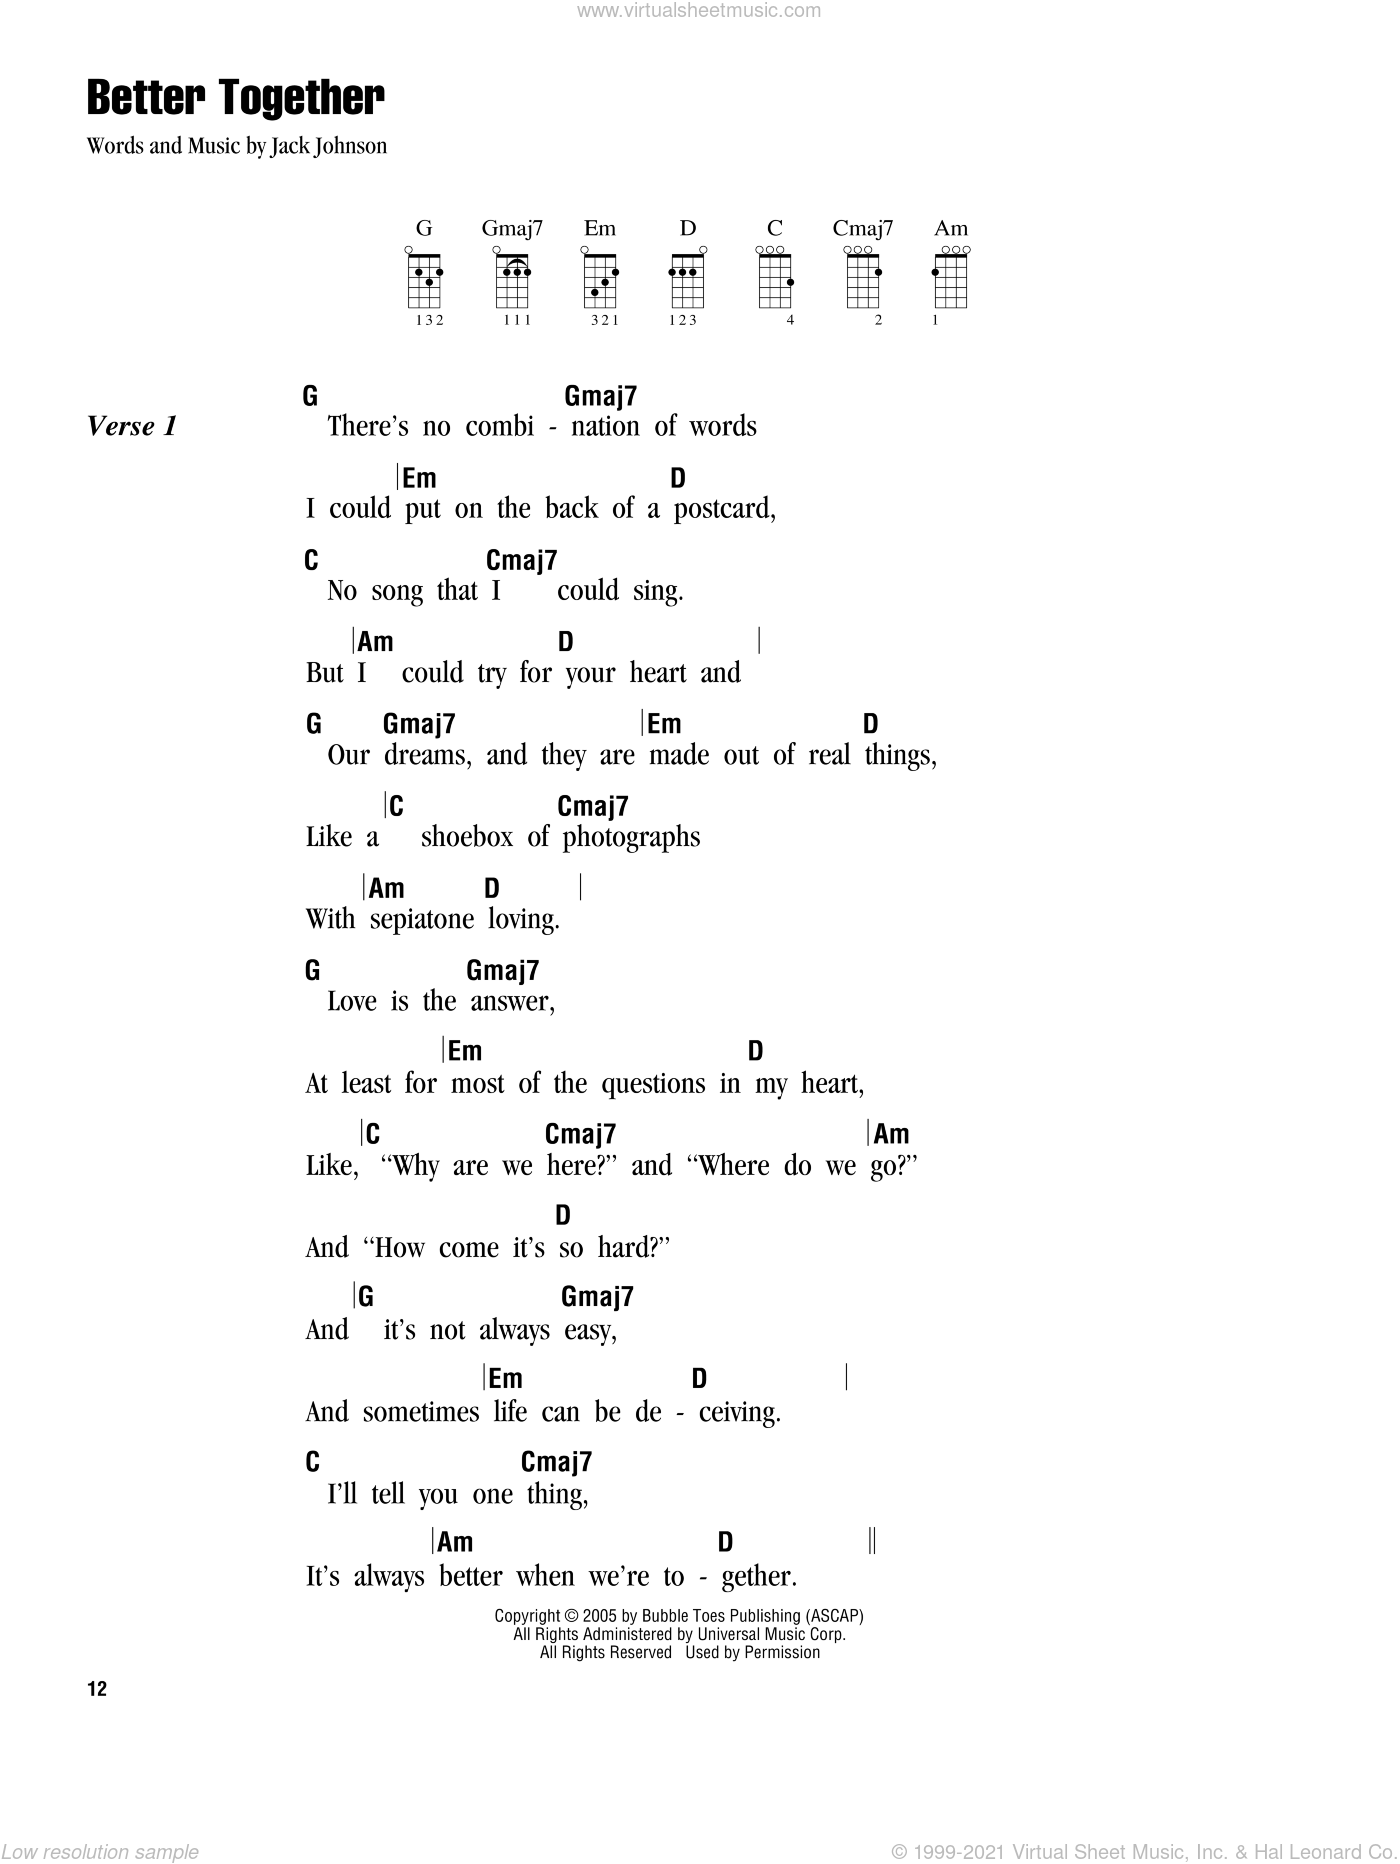 Better Together sheet music for ukulele (chords) by Jack Johnson, intermediate skill level